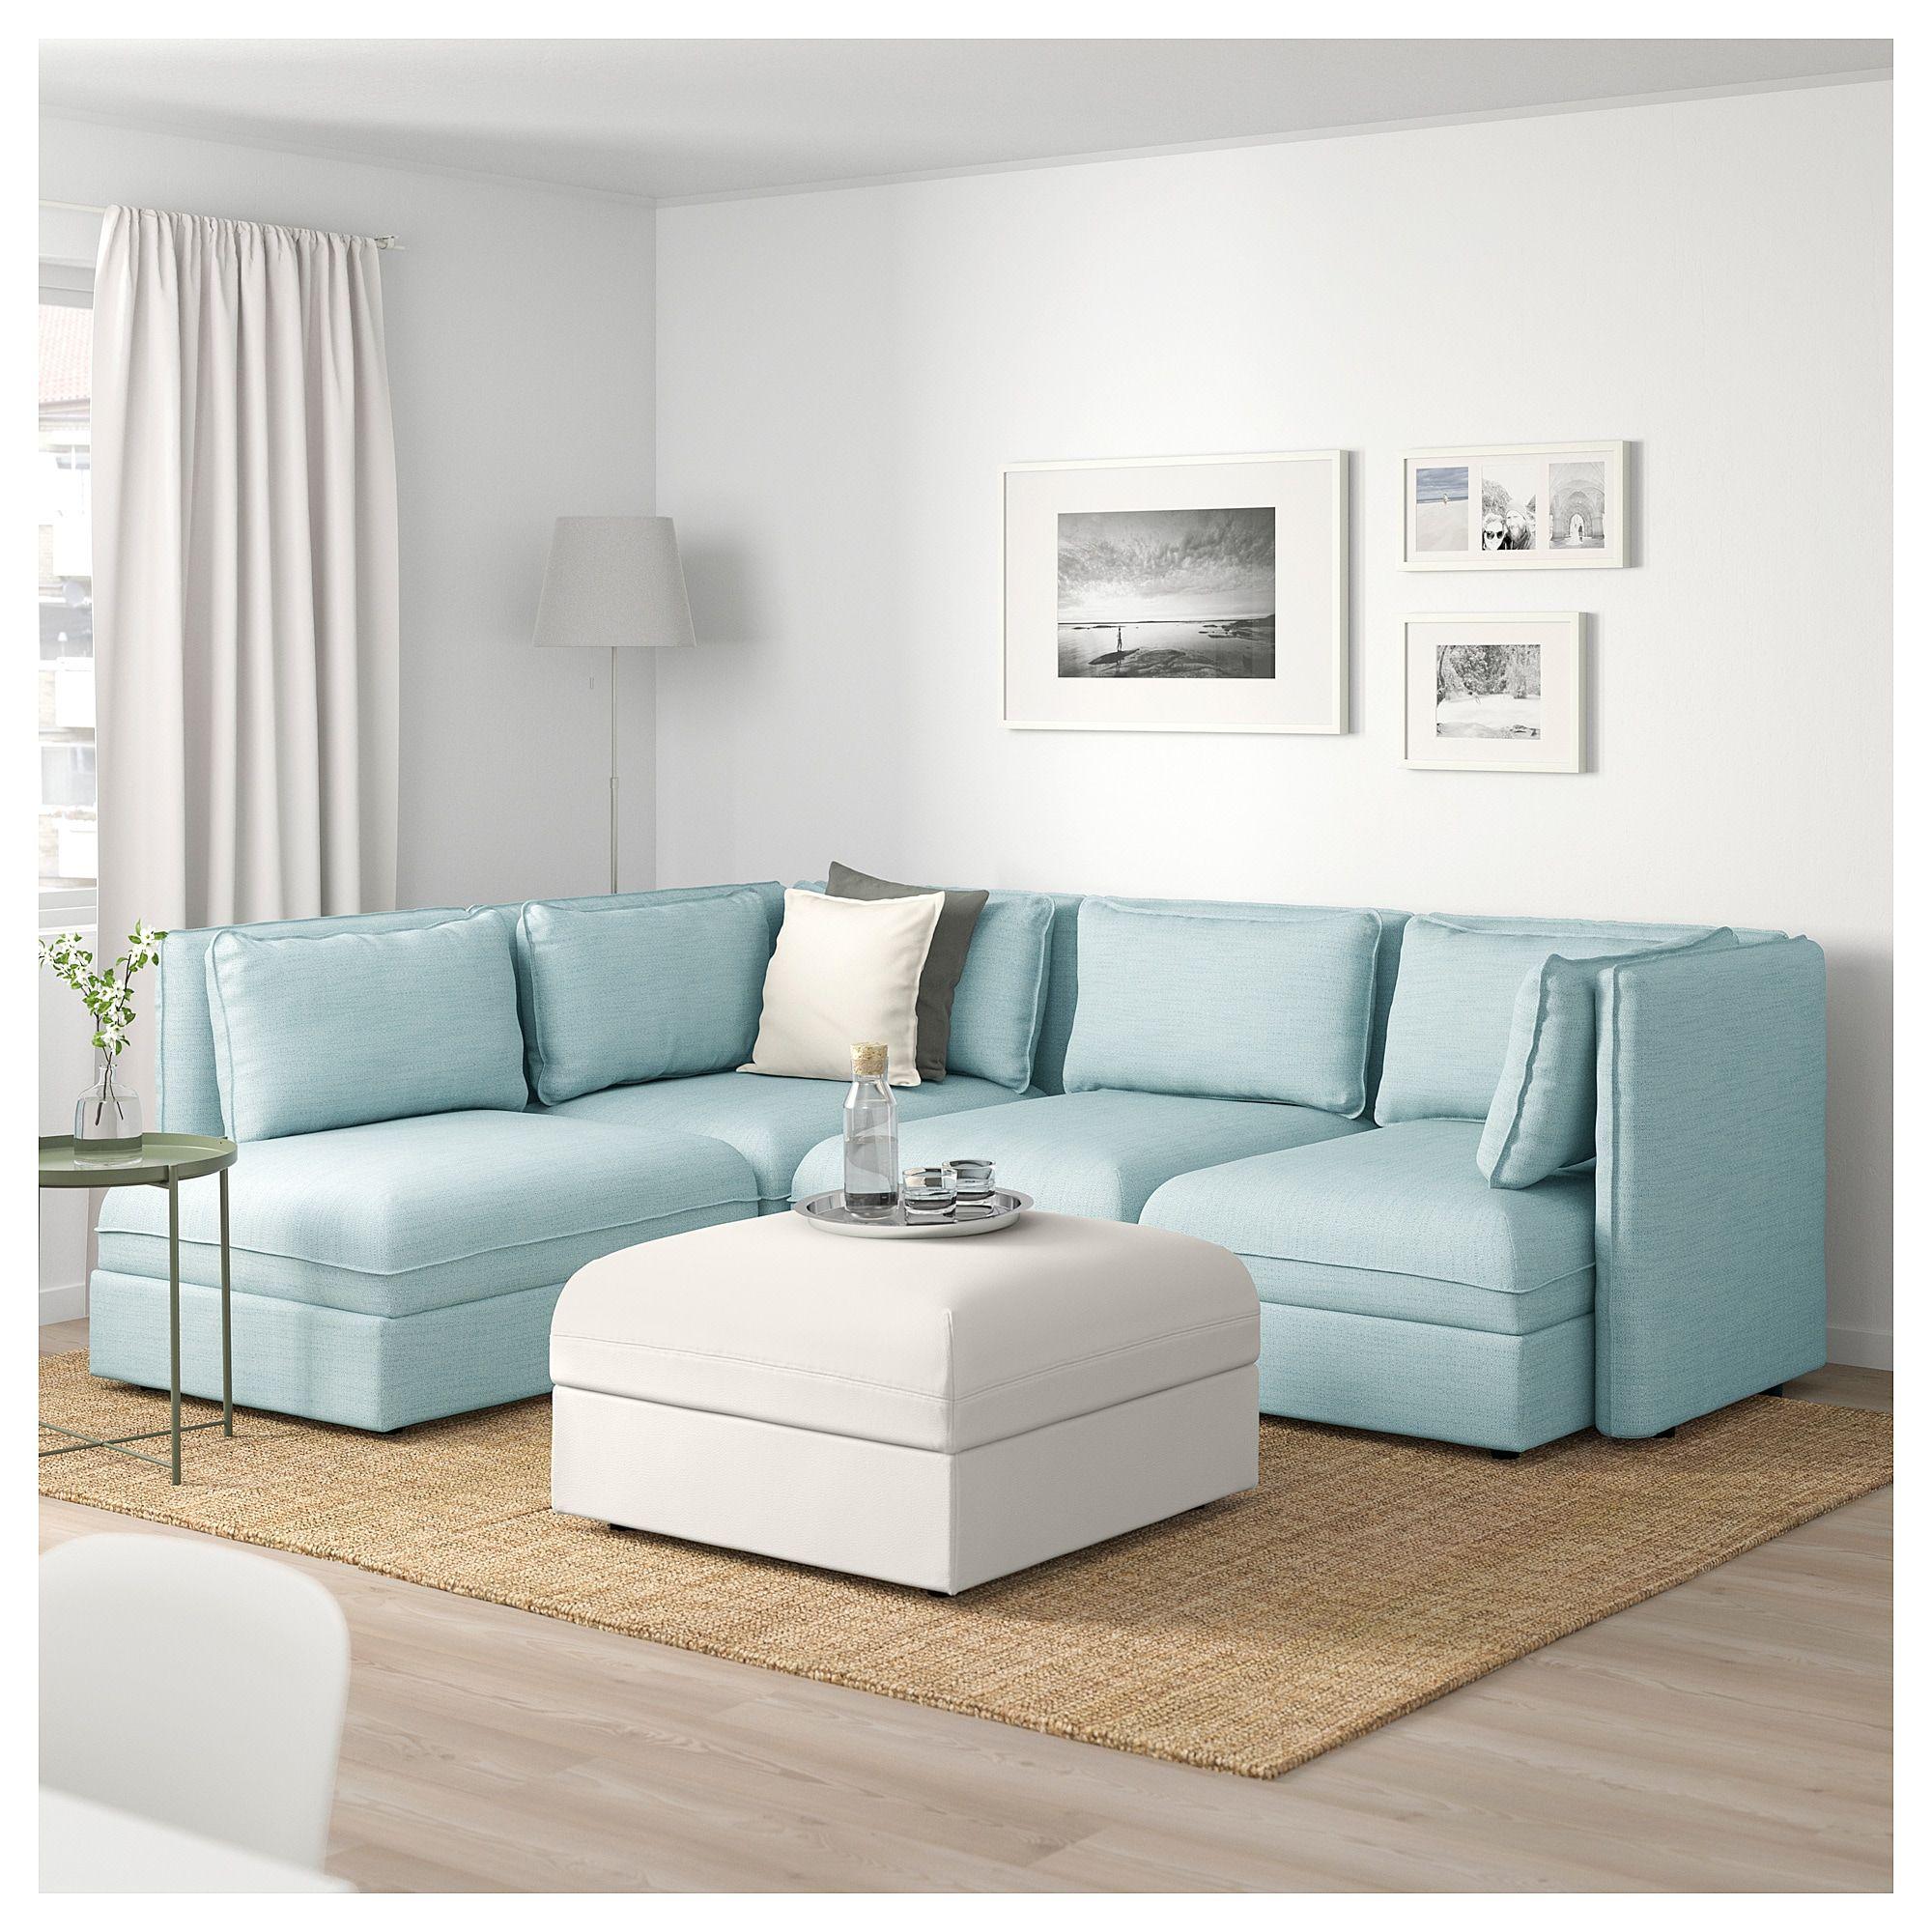 Modular Corner Sofa 4 Seat Vallentuna With Storage Hillared Murum